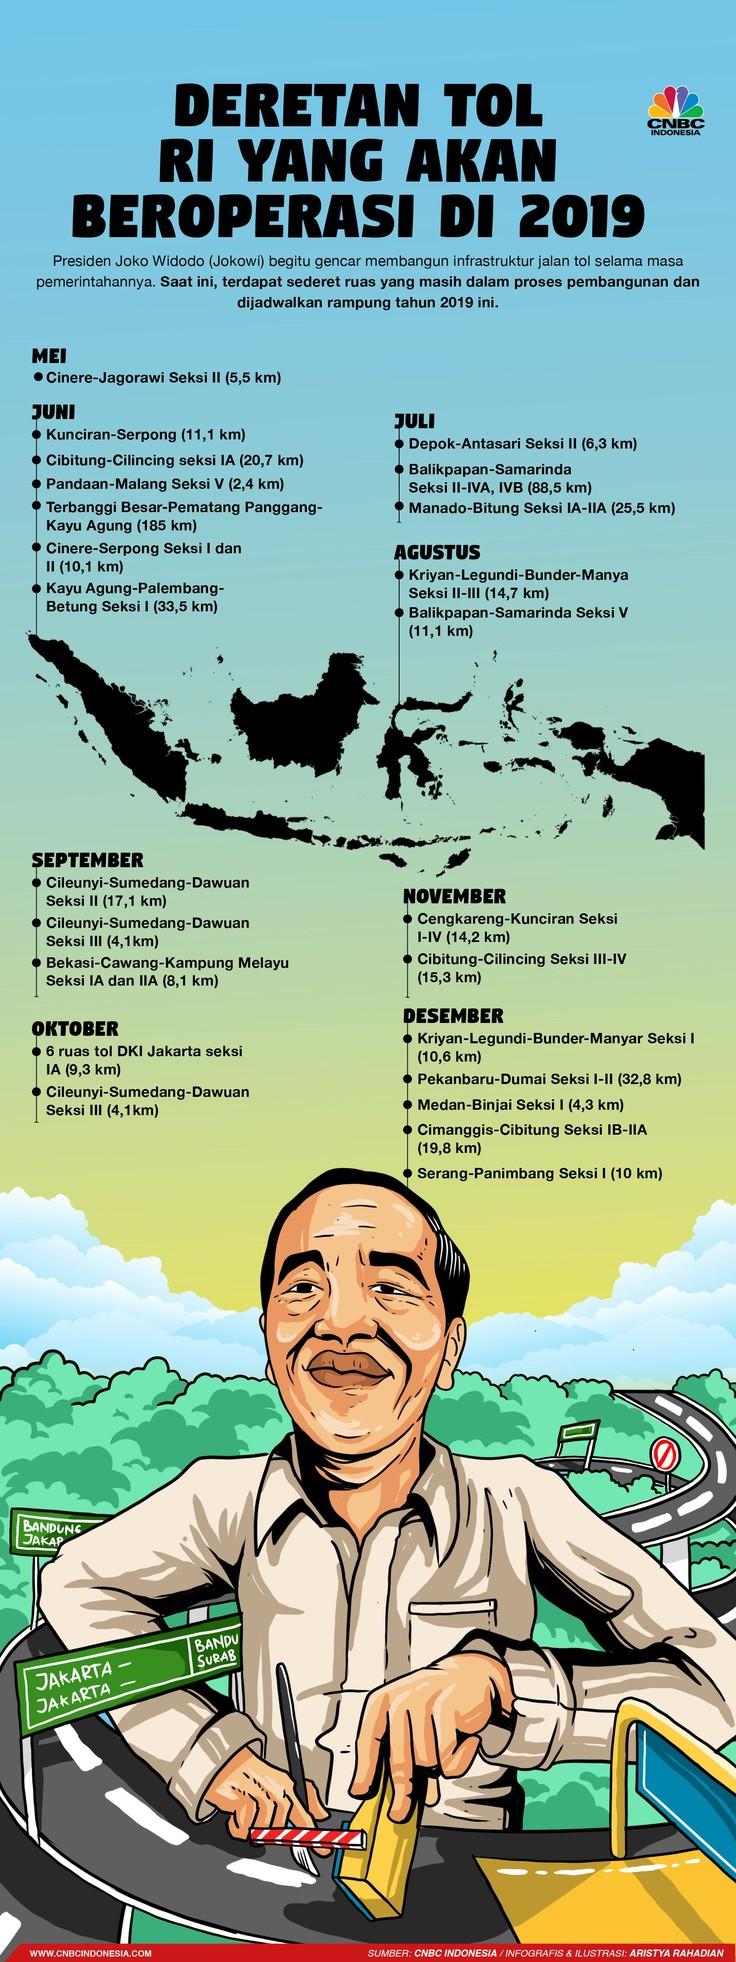 Presiden Joko Widodo (Jokowi) begitu gencar membangun infrastruktur jalan tol selama masa pemerintahannya.